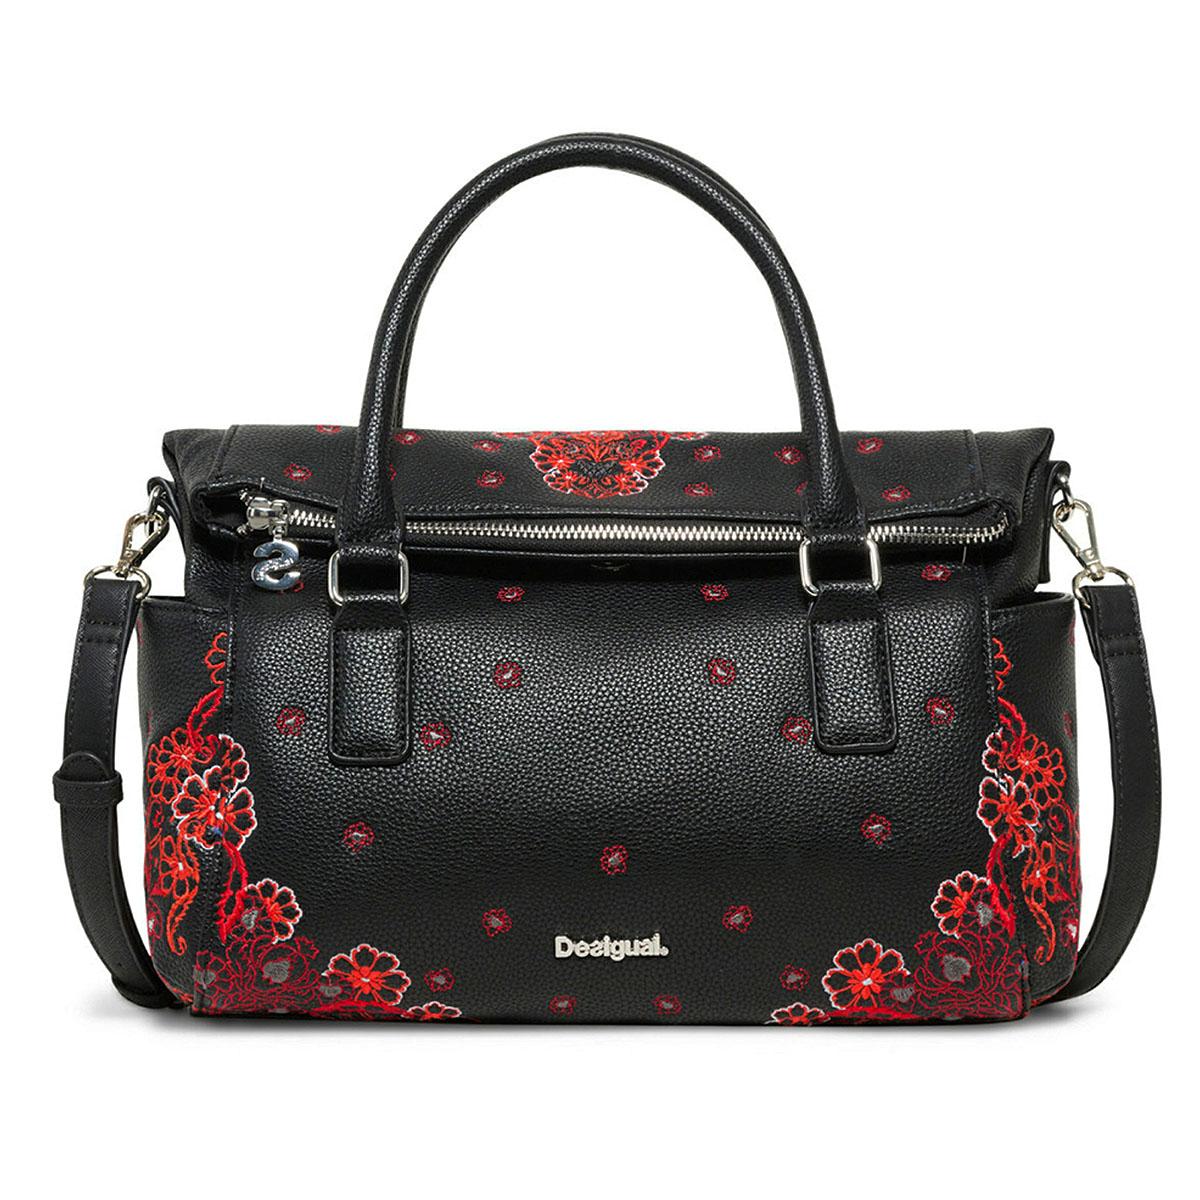 Desigual Handtasche Tasche Bols Manuela Foulard Loverty 18WAXPCC/2000